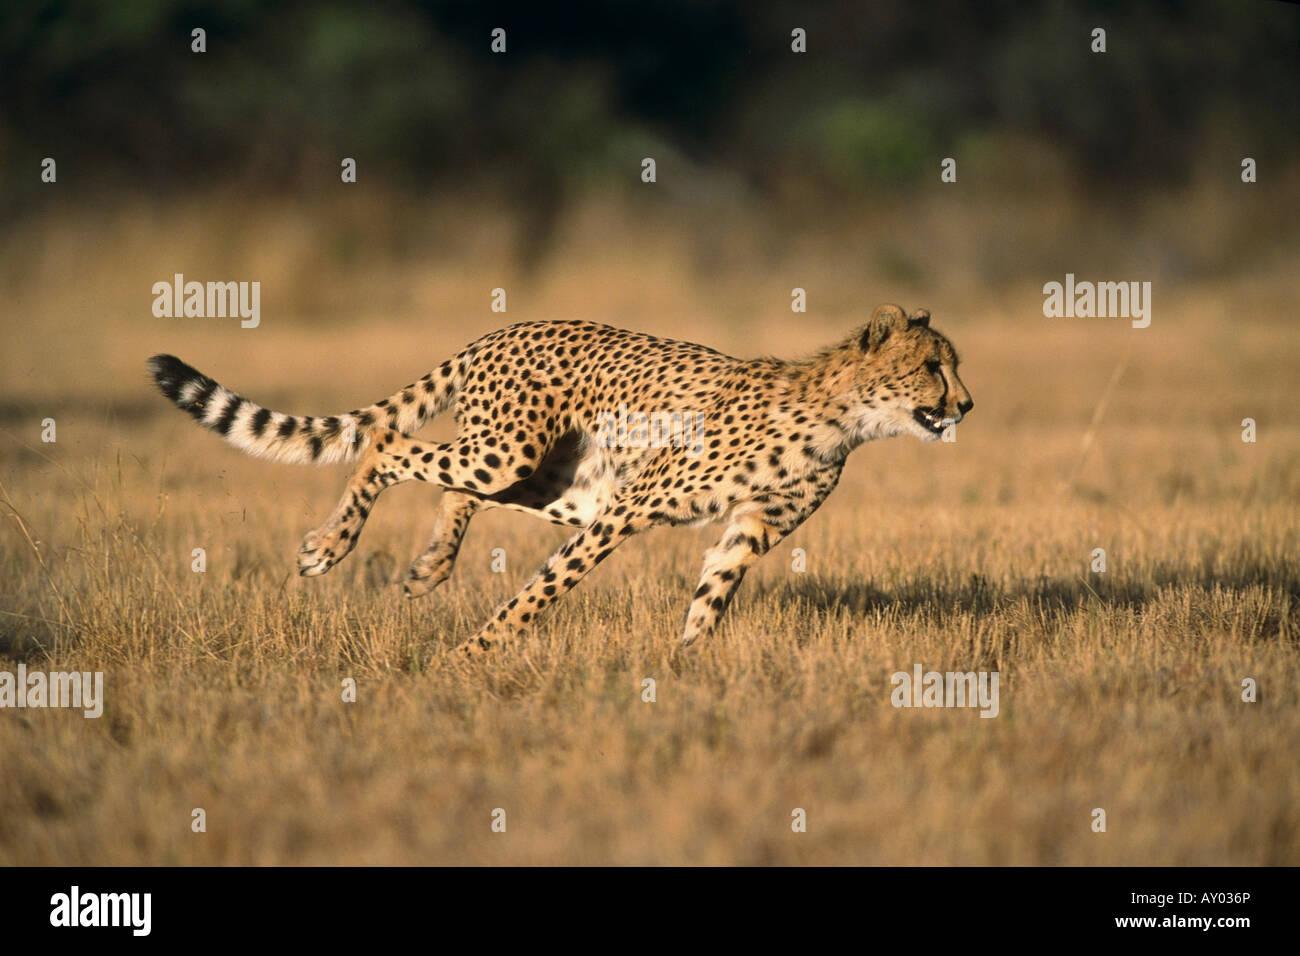 spotted - Cheetah sitting on hill on masai mara plane